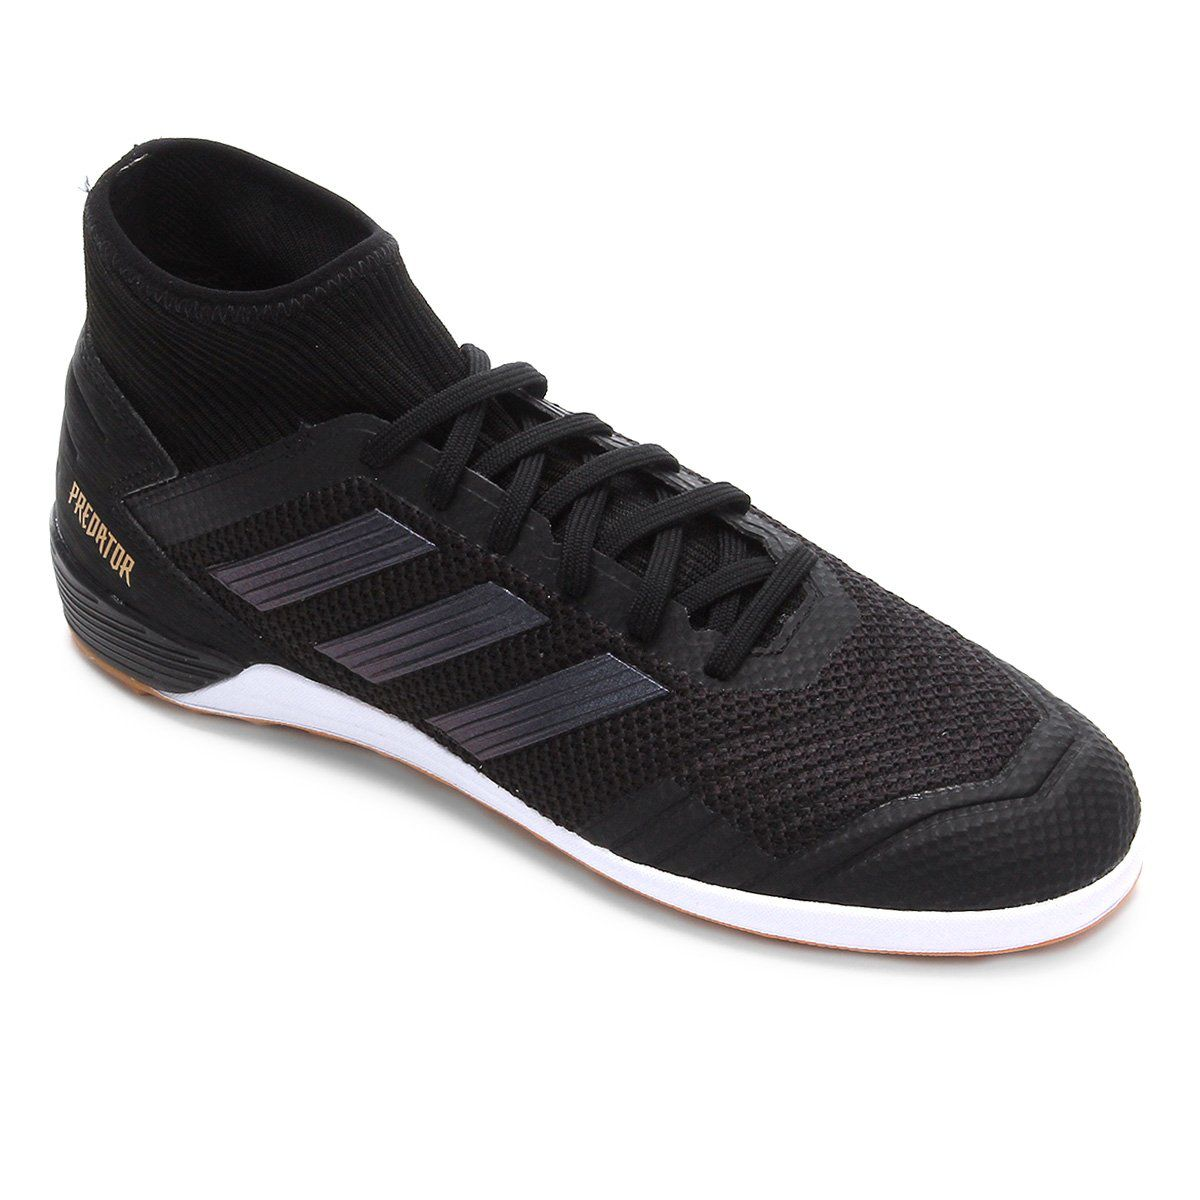 Chuteira Futsal Adidas Predator 19.3 IN - Masculino - Preto